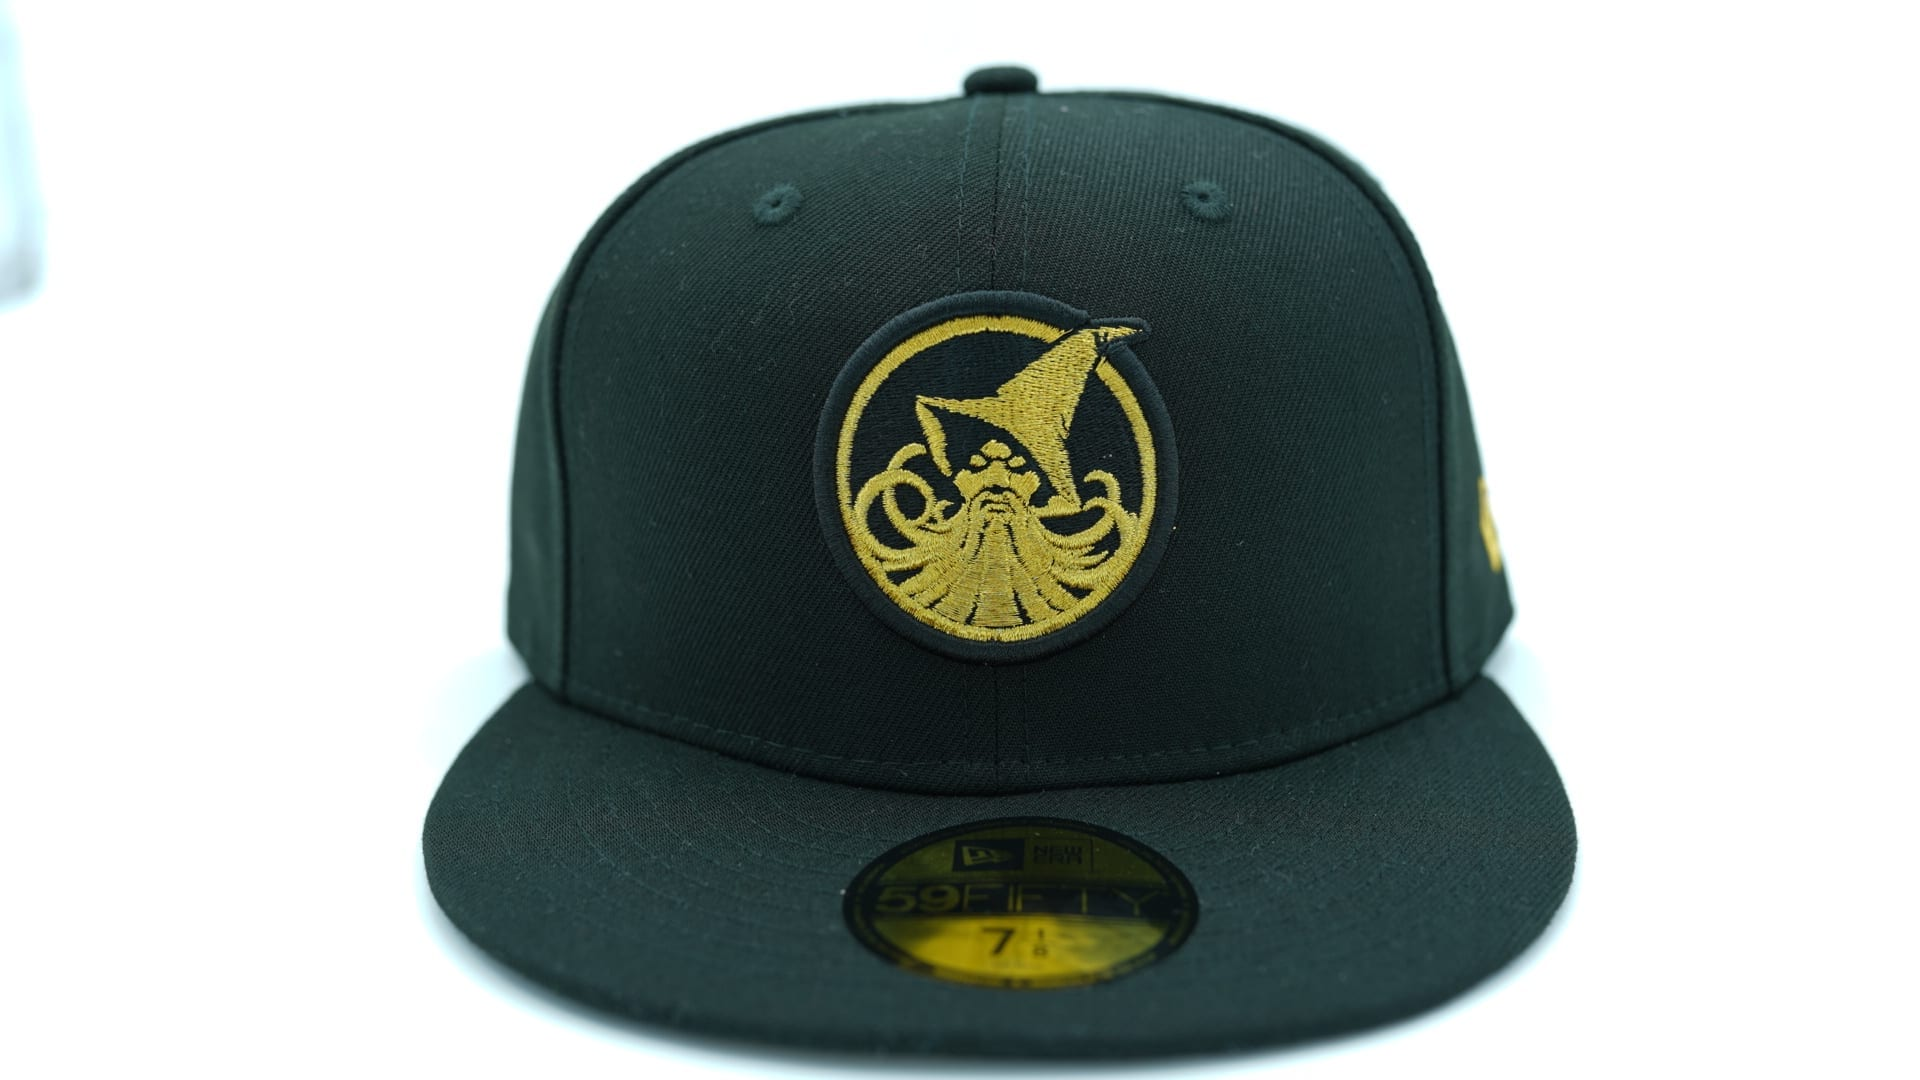 carhartt-new-era-59Fifty-fitted-baseball-cap-hat